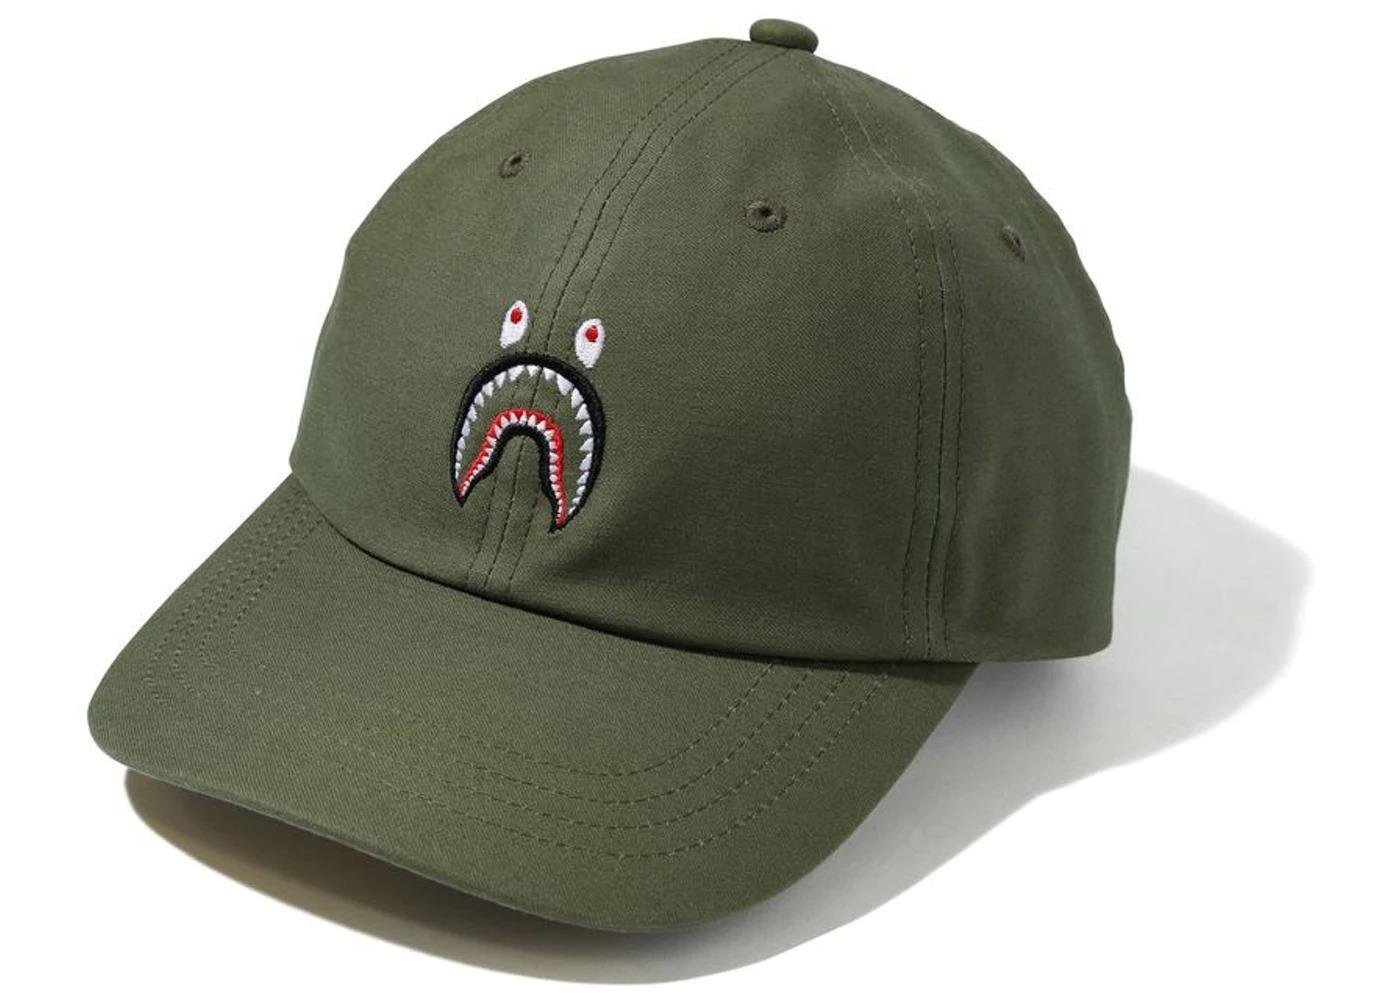 Bape Shark Panel Cap Olivedrab/Green (SS21)の写真